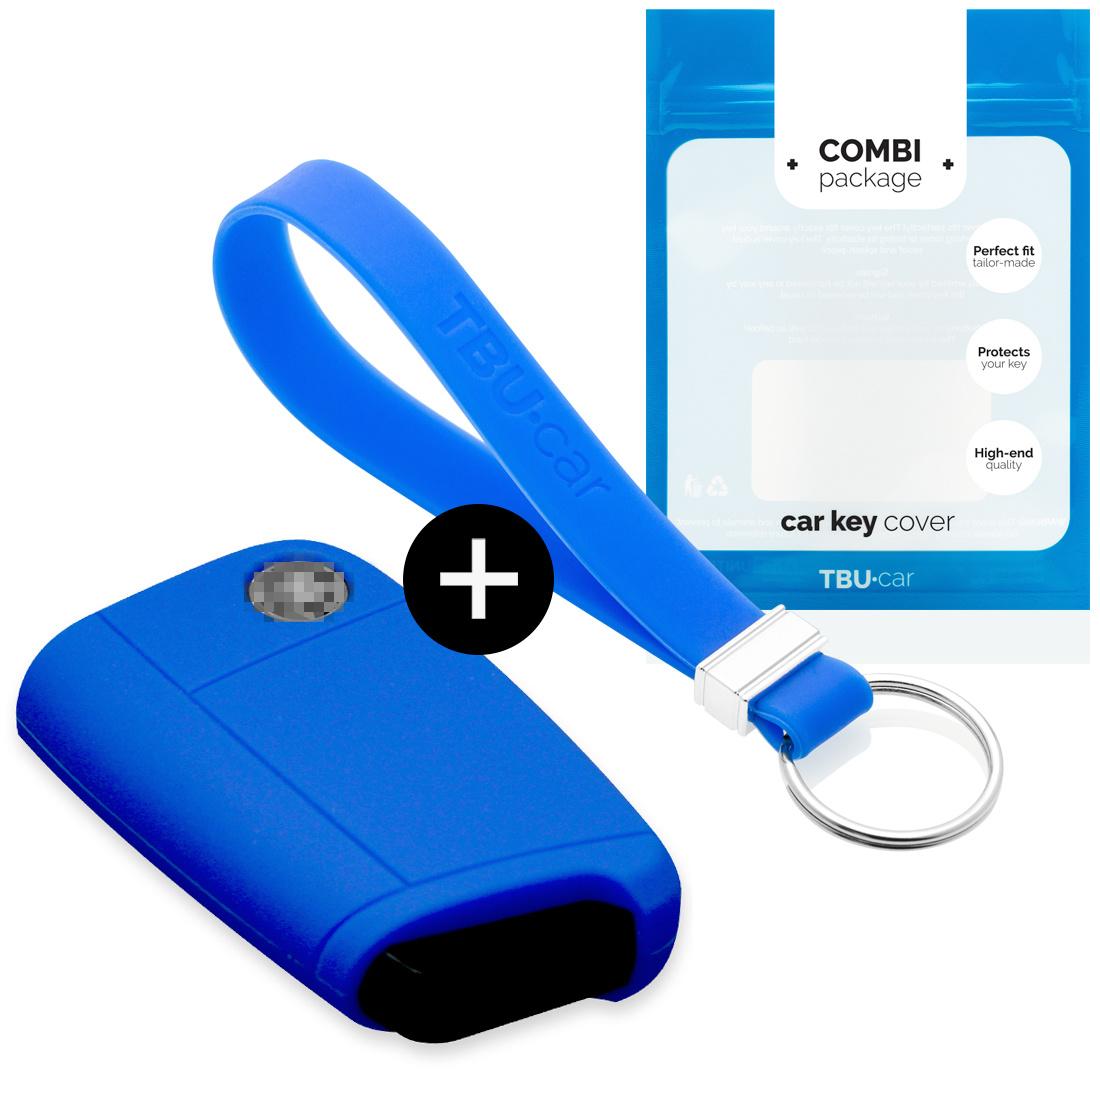 TBU car TBU car Autoschlüssel Hülle kompatibel mit Seat 3 Tasten - Schutzhülle aus Silikon - Auto Schlüsselhülle Cover in Blau